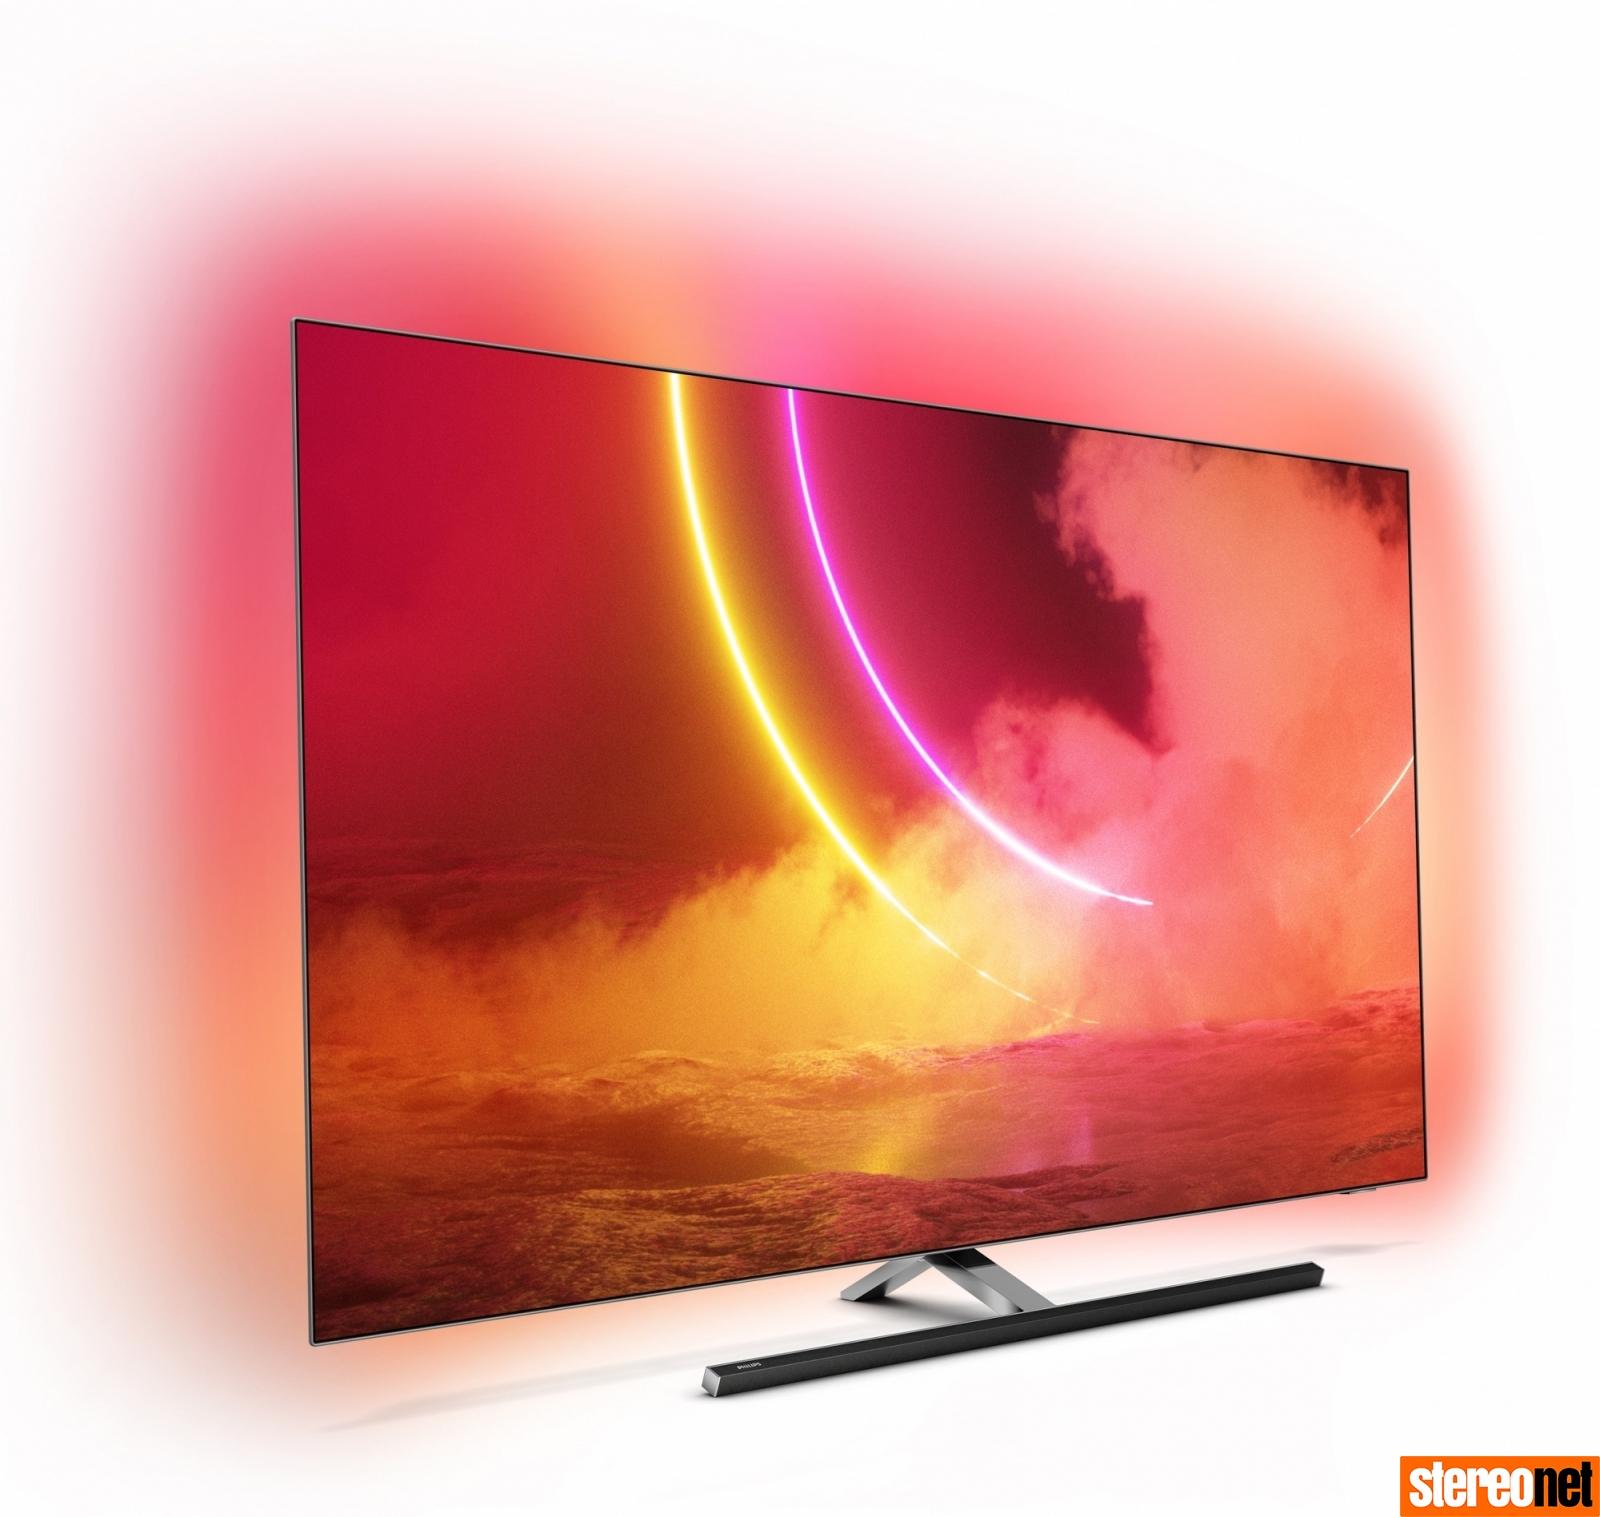 Philips 865 OLED TV